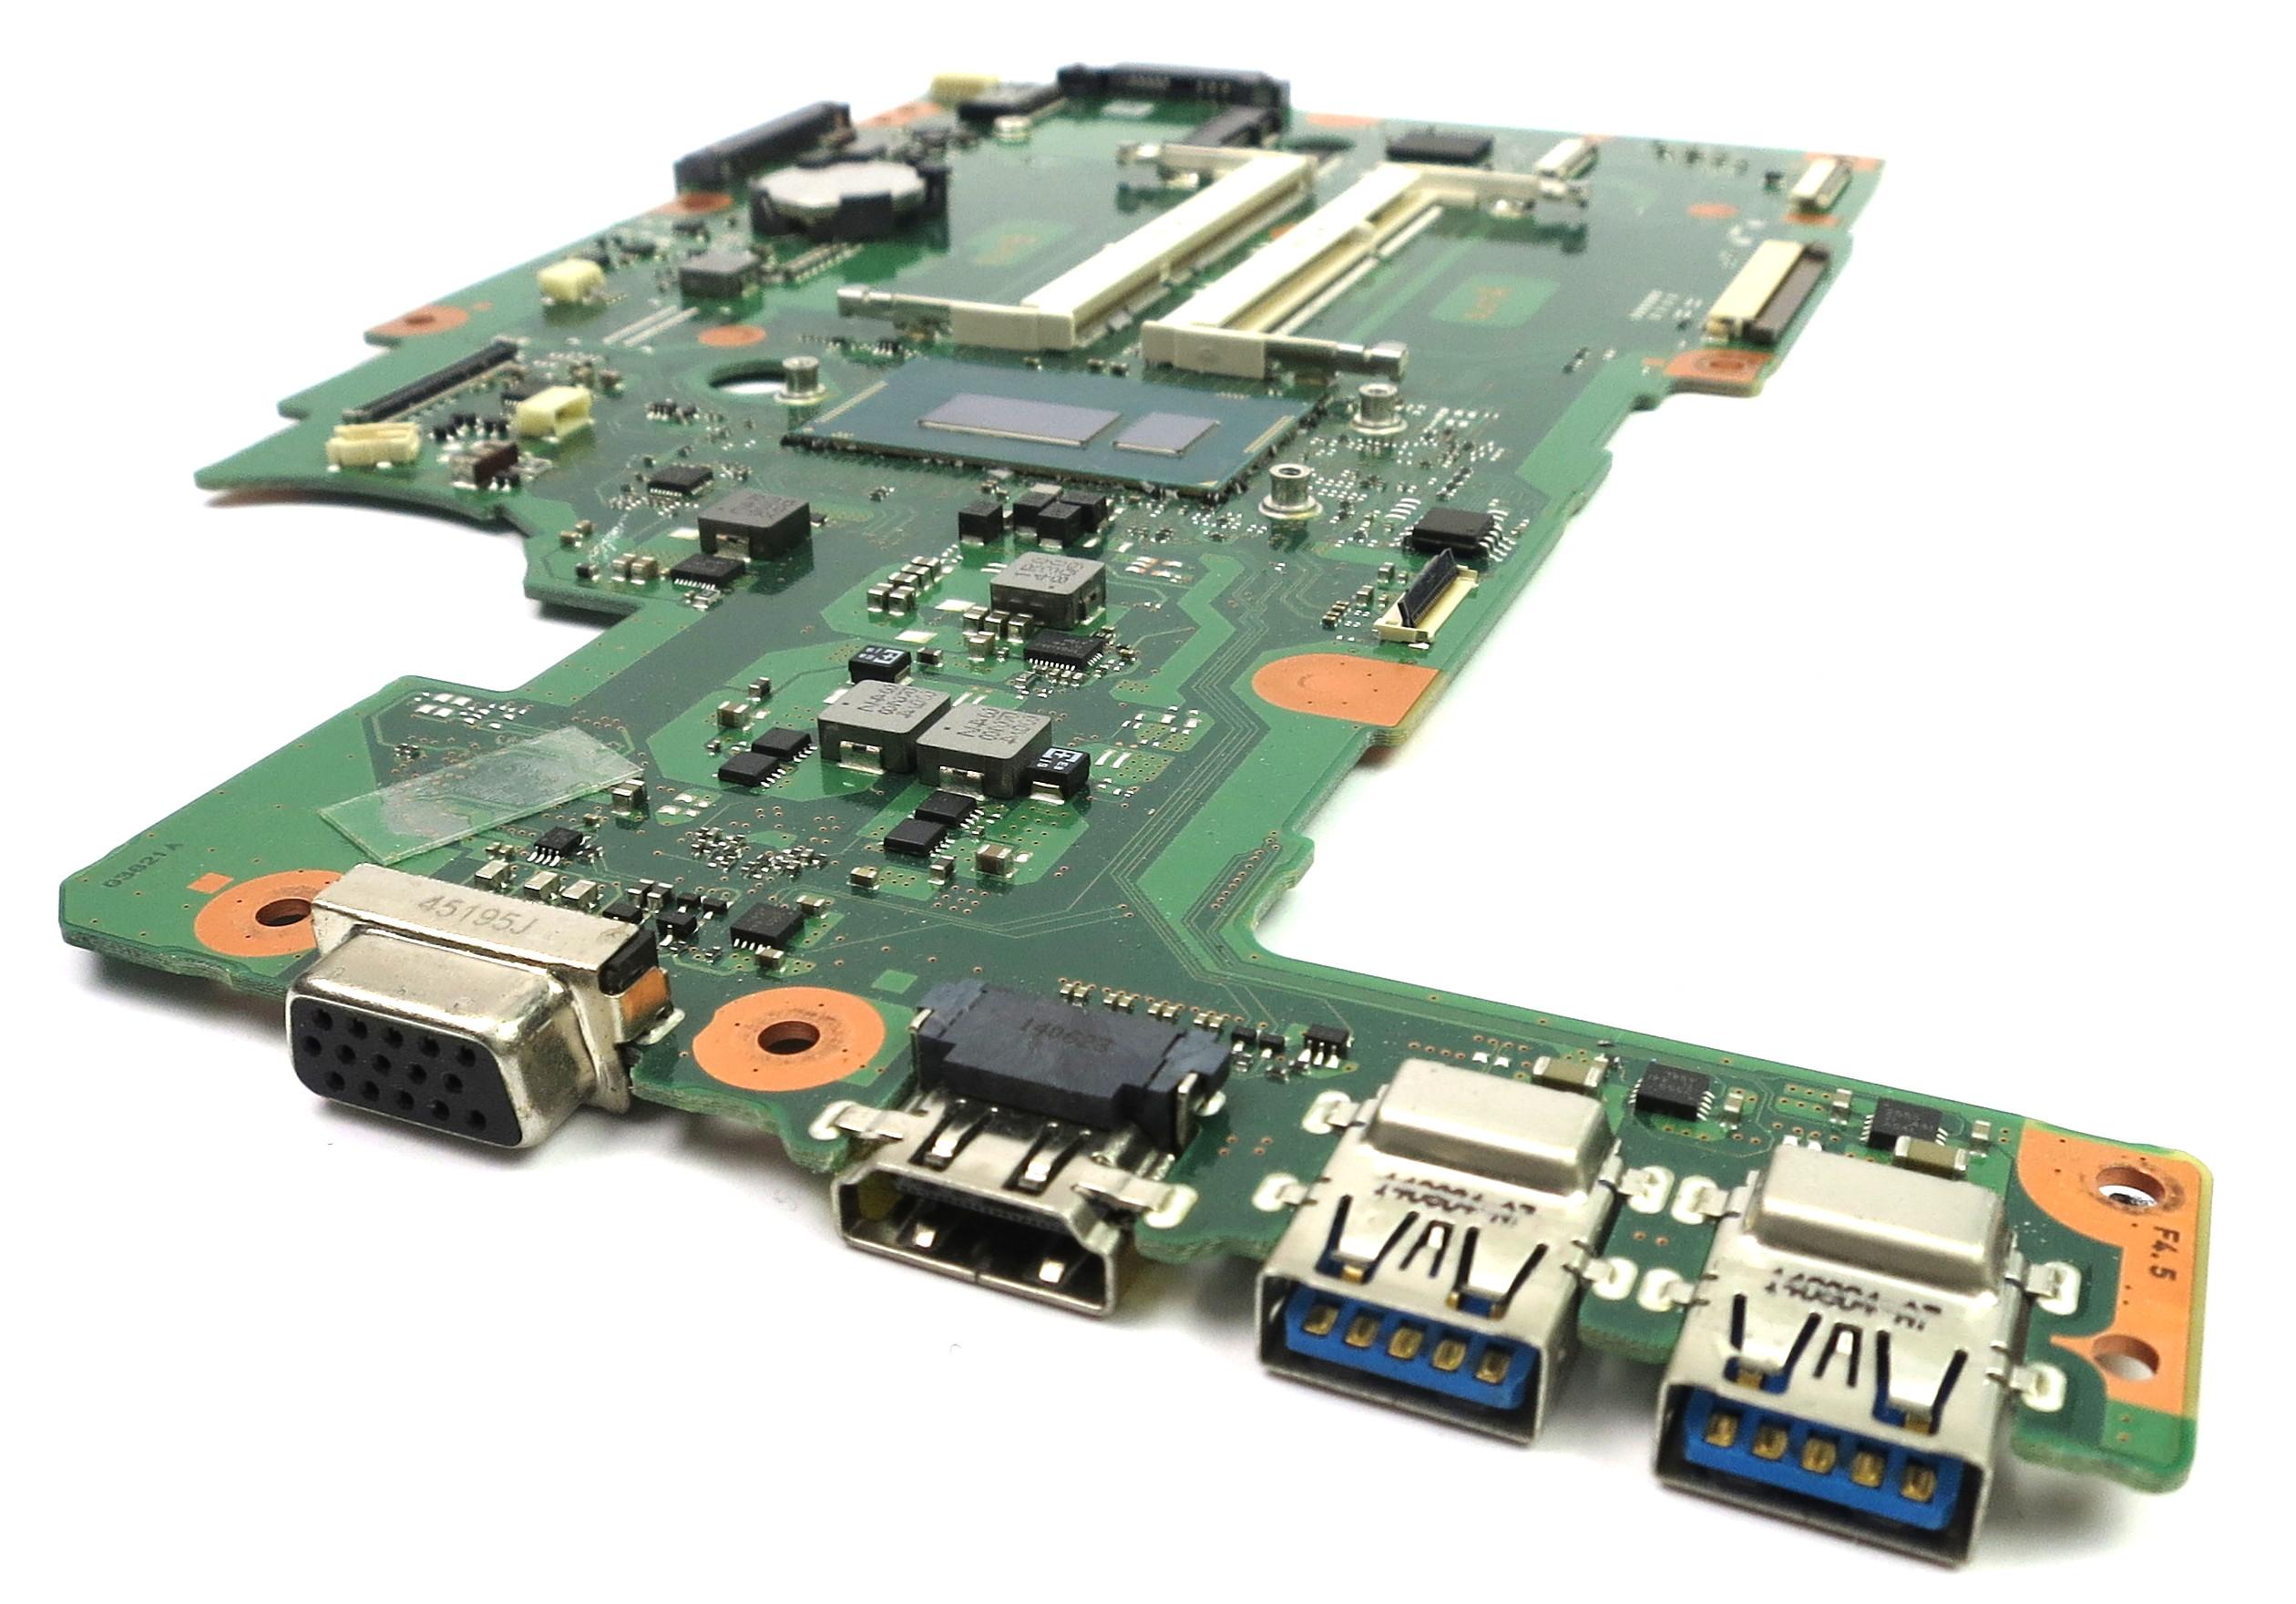 Toshiba FALESY1 Satellite Pro R50-B with Intel Core i3-4005U - A5A003821010